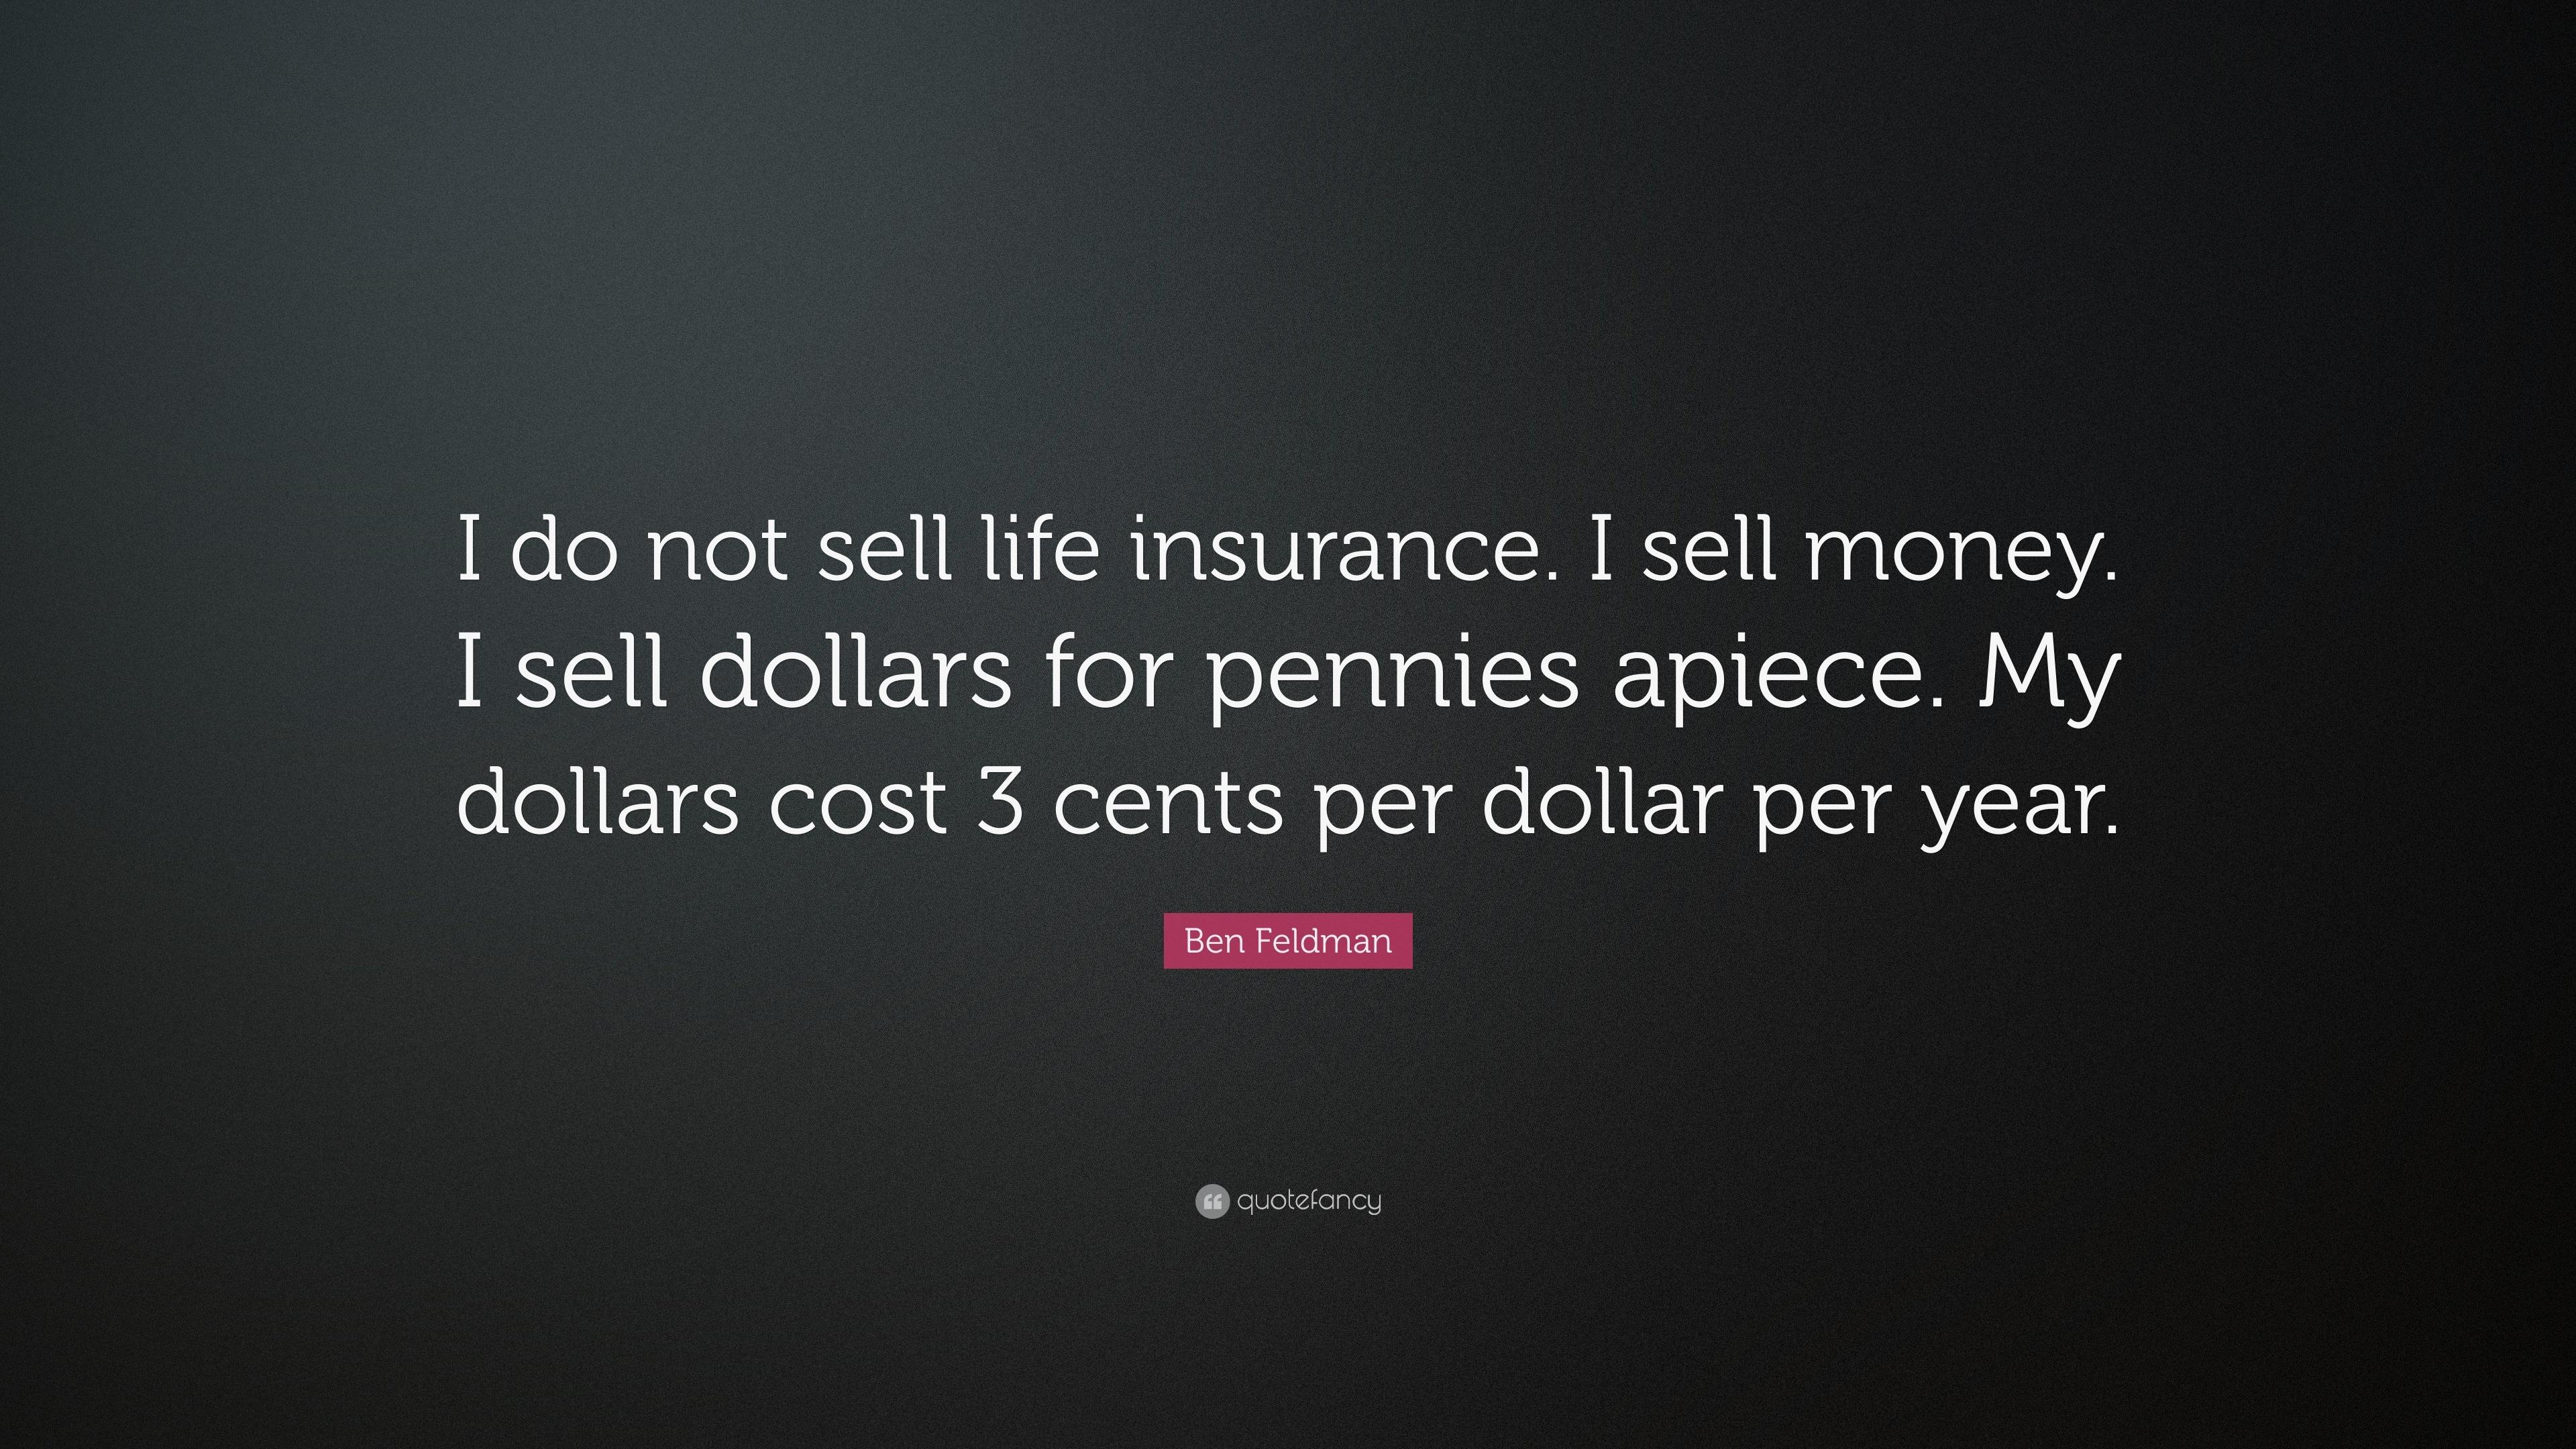 Life Insurance Quotes Progressive Ben Feldman Insurance Quotes  Raipurnews